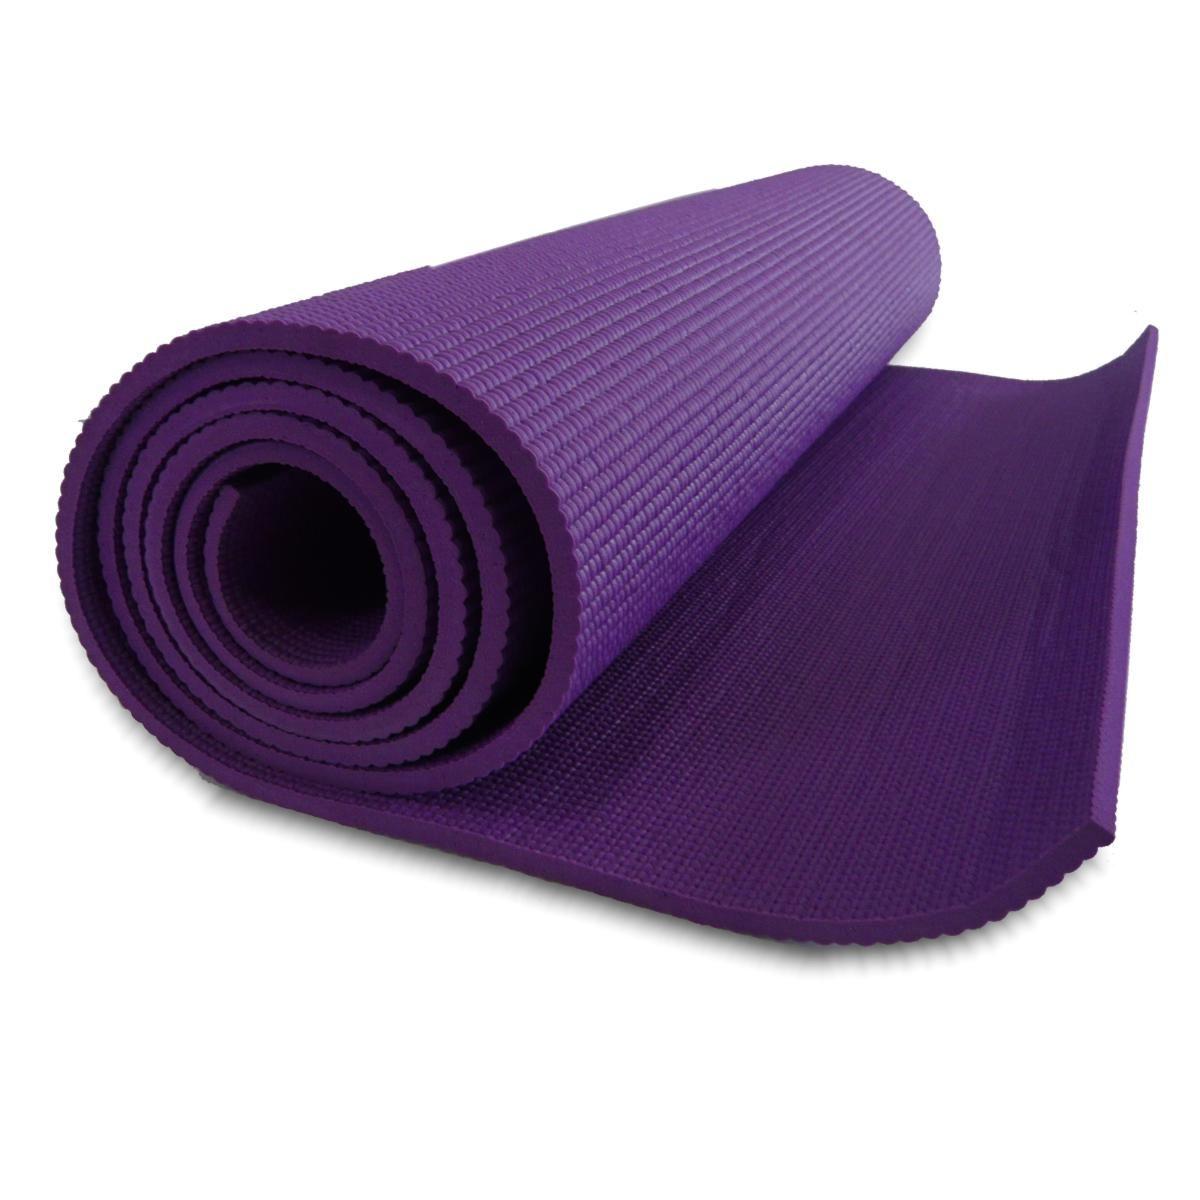 tapete para yoga 61x1,73m retangular pvc havan roxo   pinterest